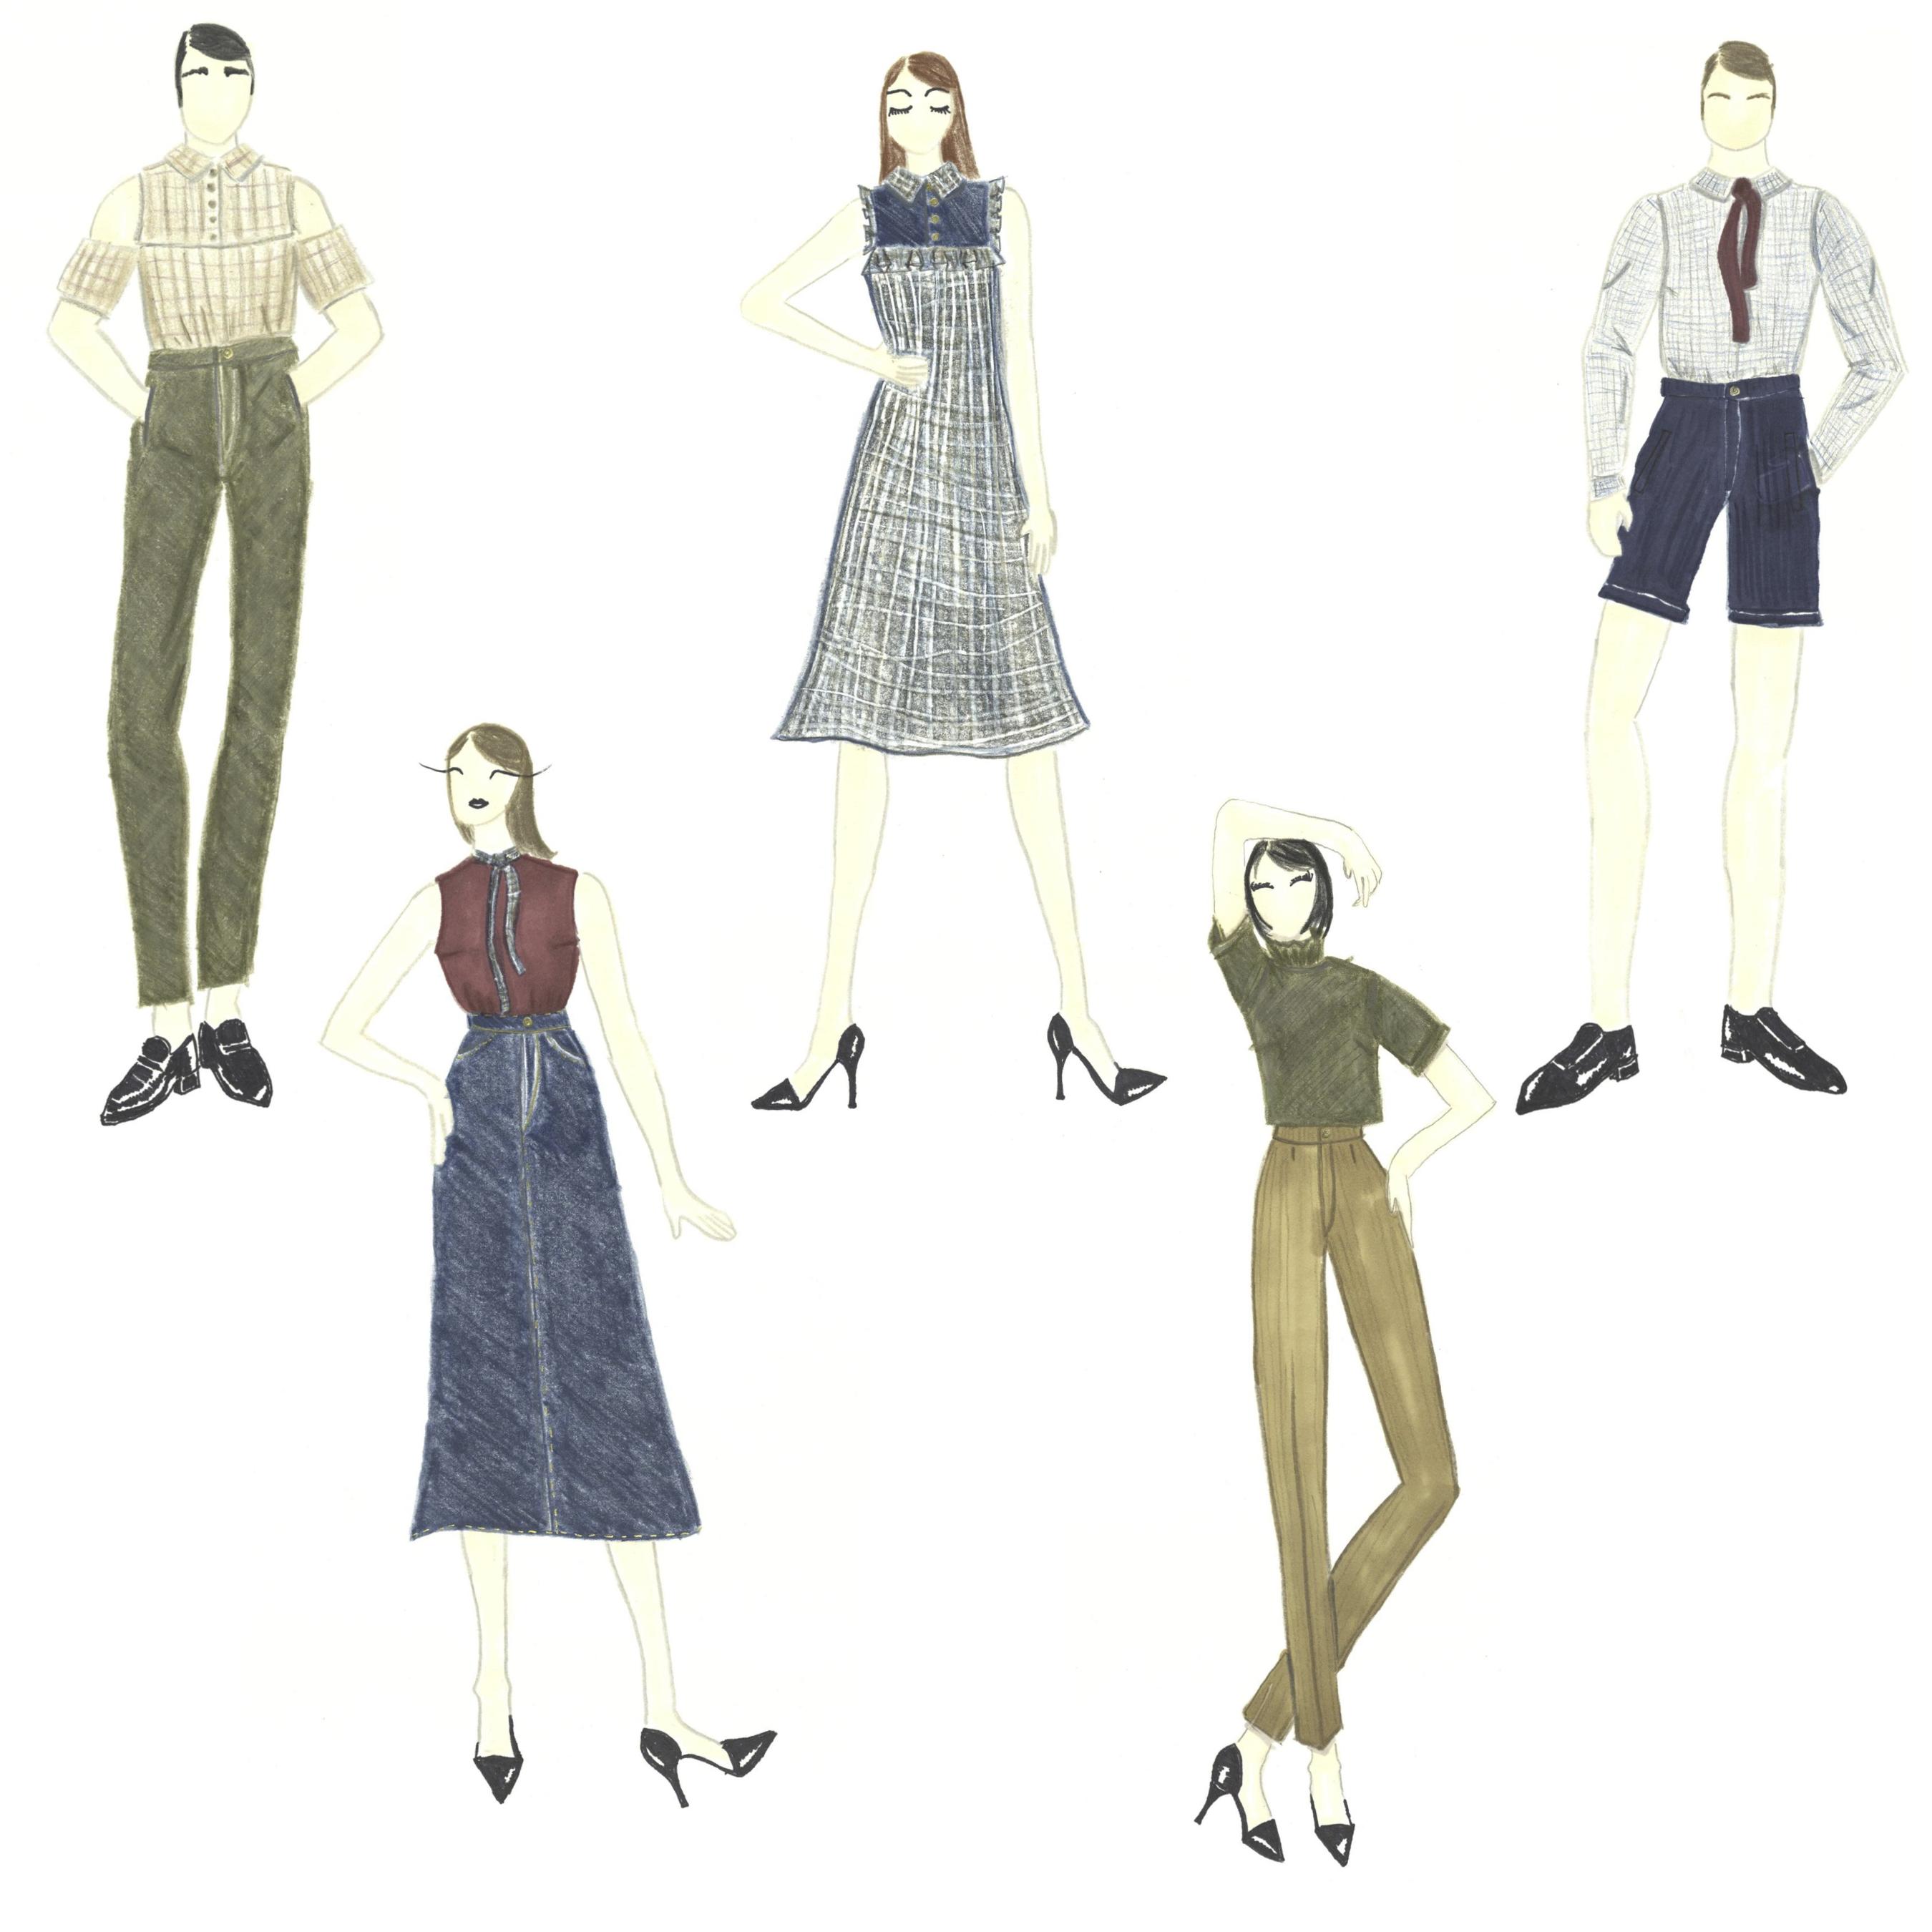 Kvietok_Fashion Illustration Collection (1)